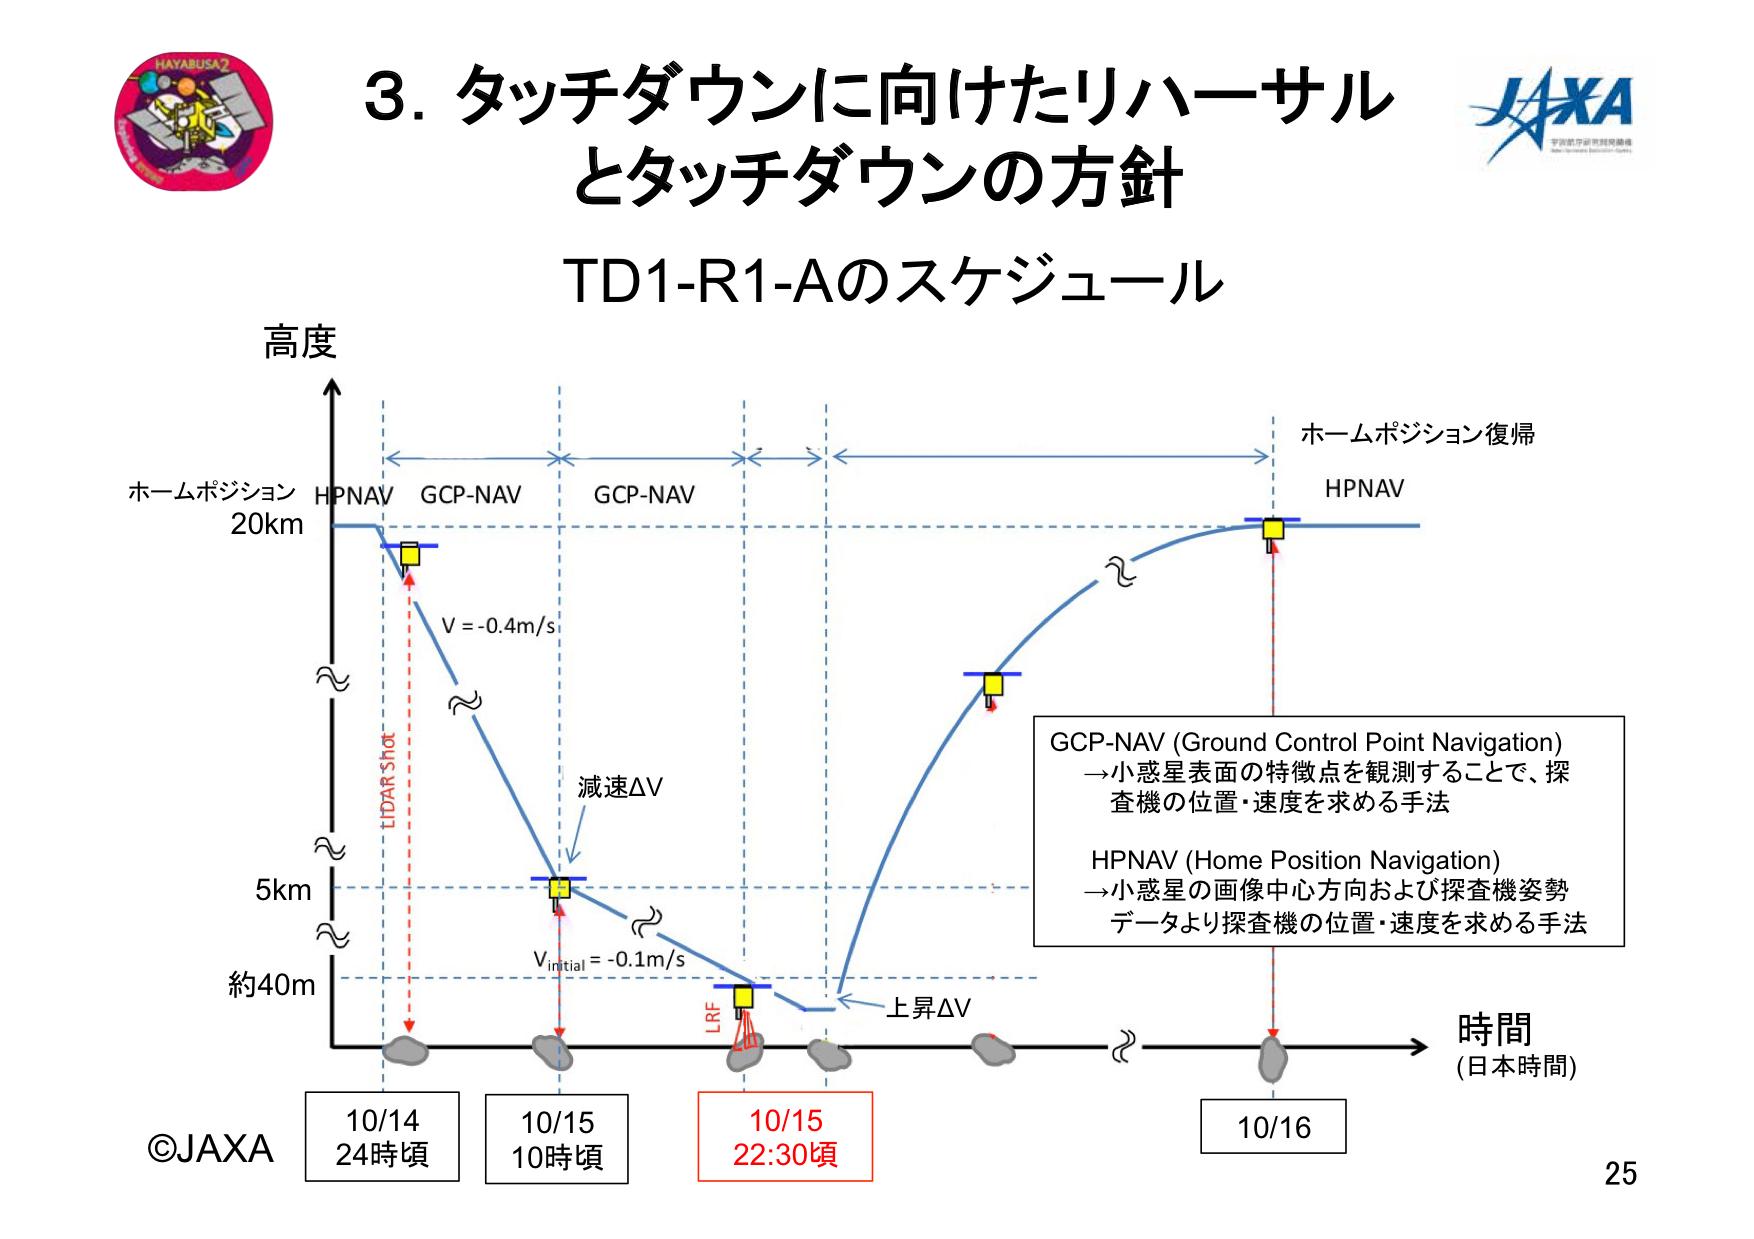 f:id:Imamura:20181011154004p:plain